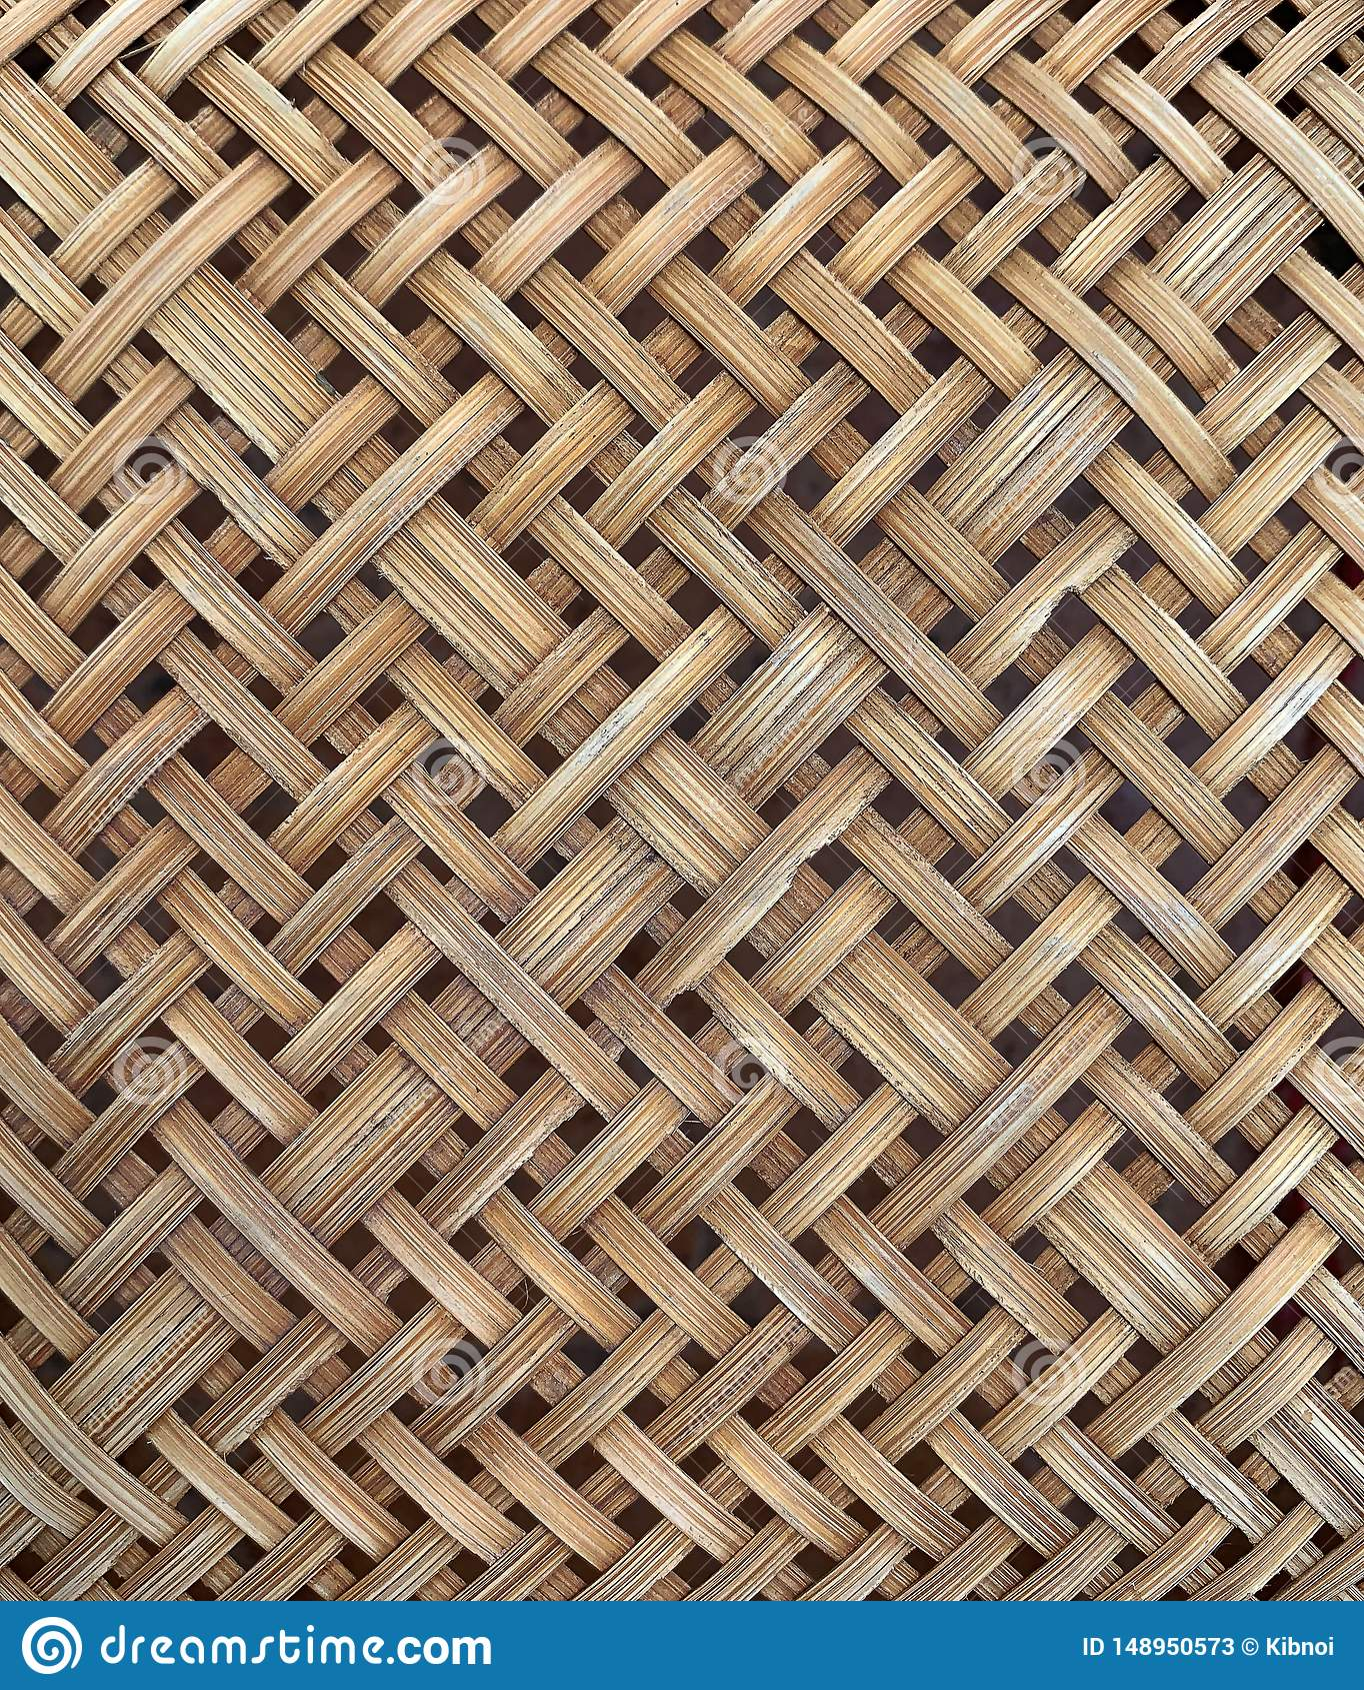 Passoire en bambou